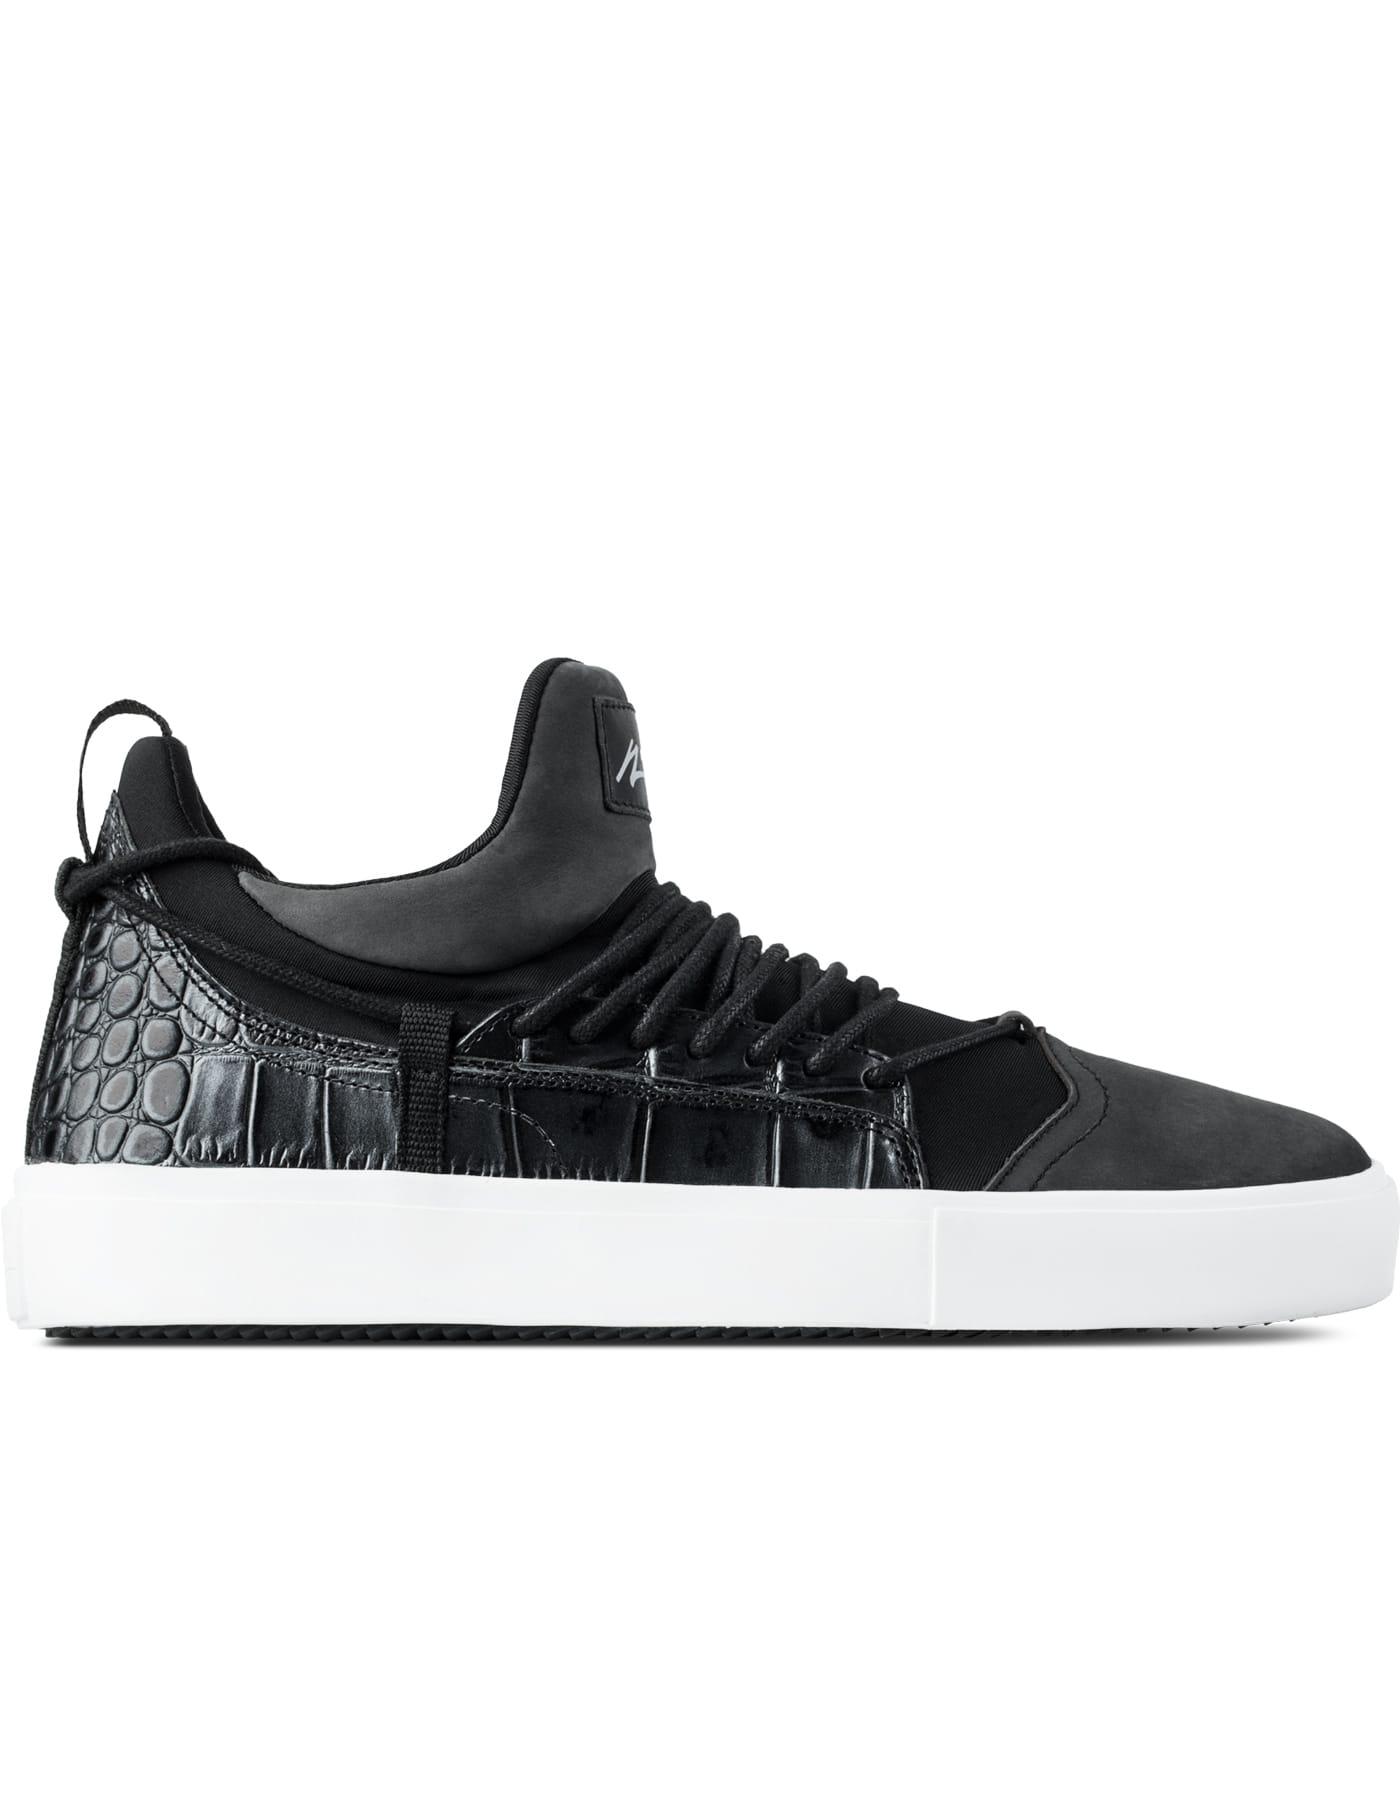 article n˚_____ - Black/Black 0714-0314 Shoes